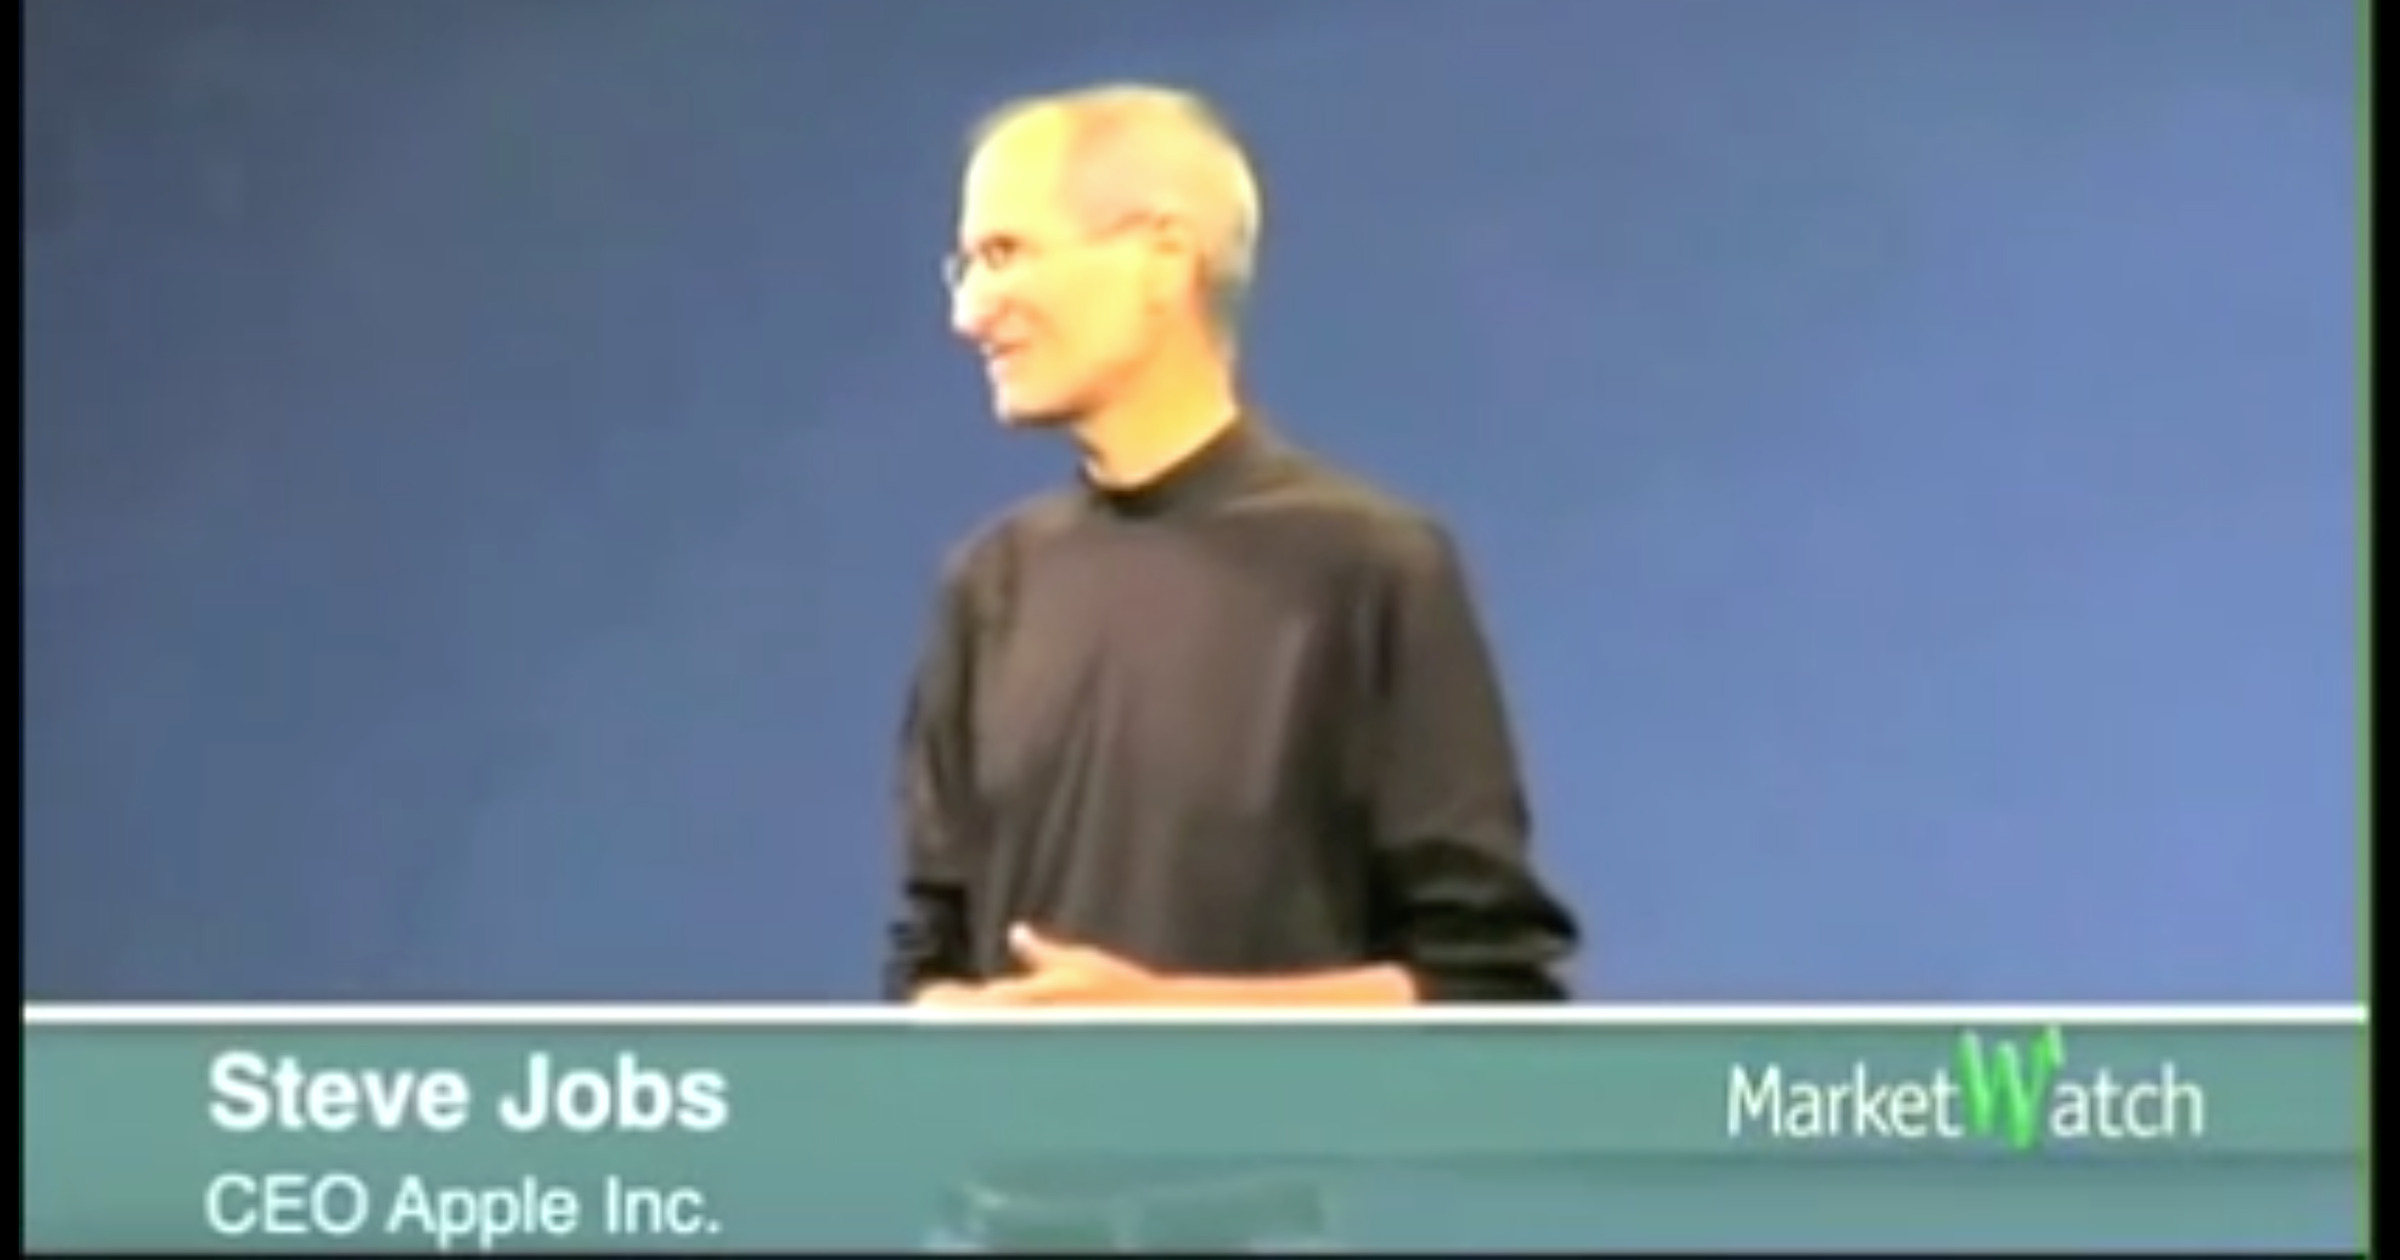 Steve Jobs return liver transplant